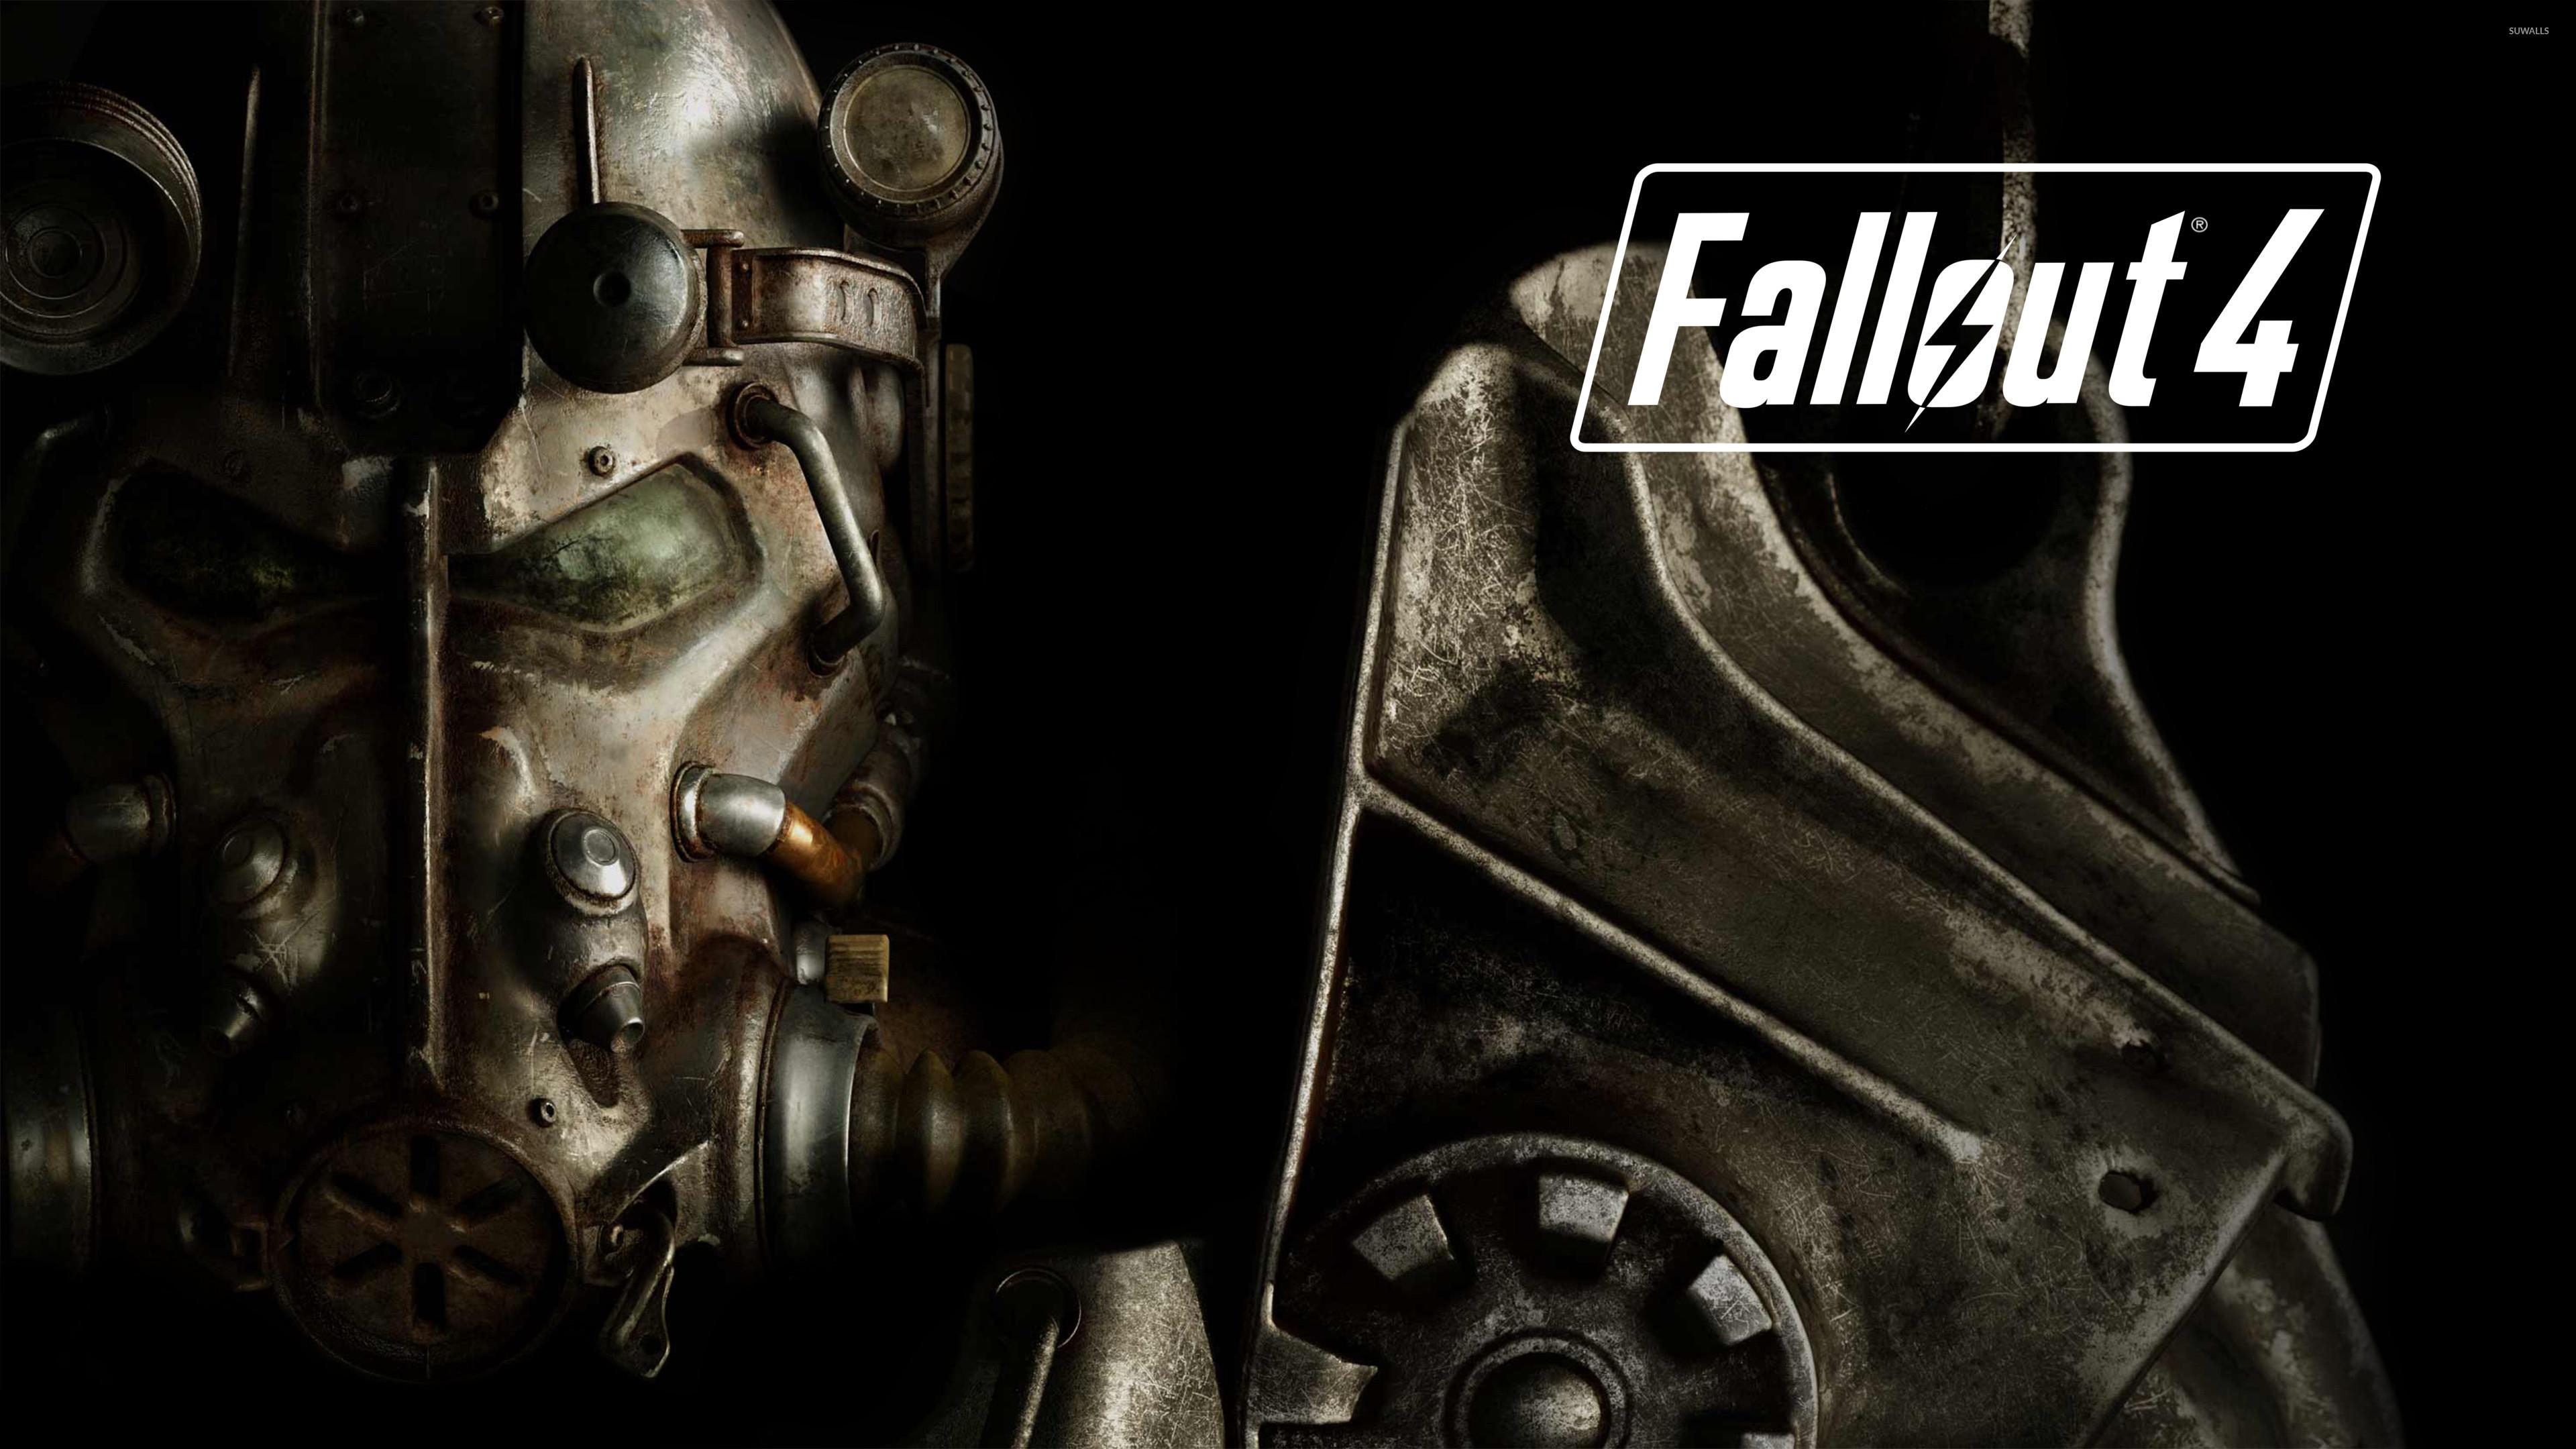 Fallout 4 armor wallpaper jpg